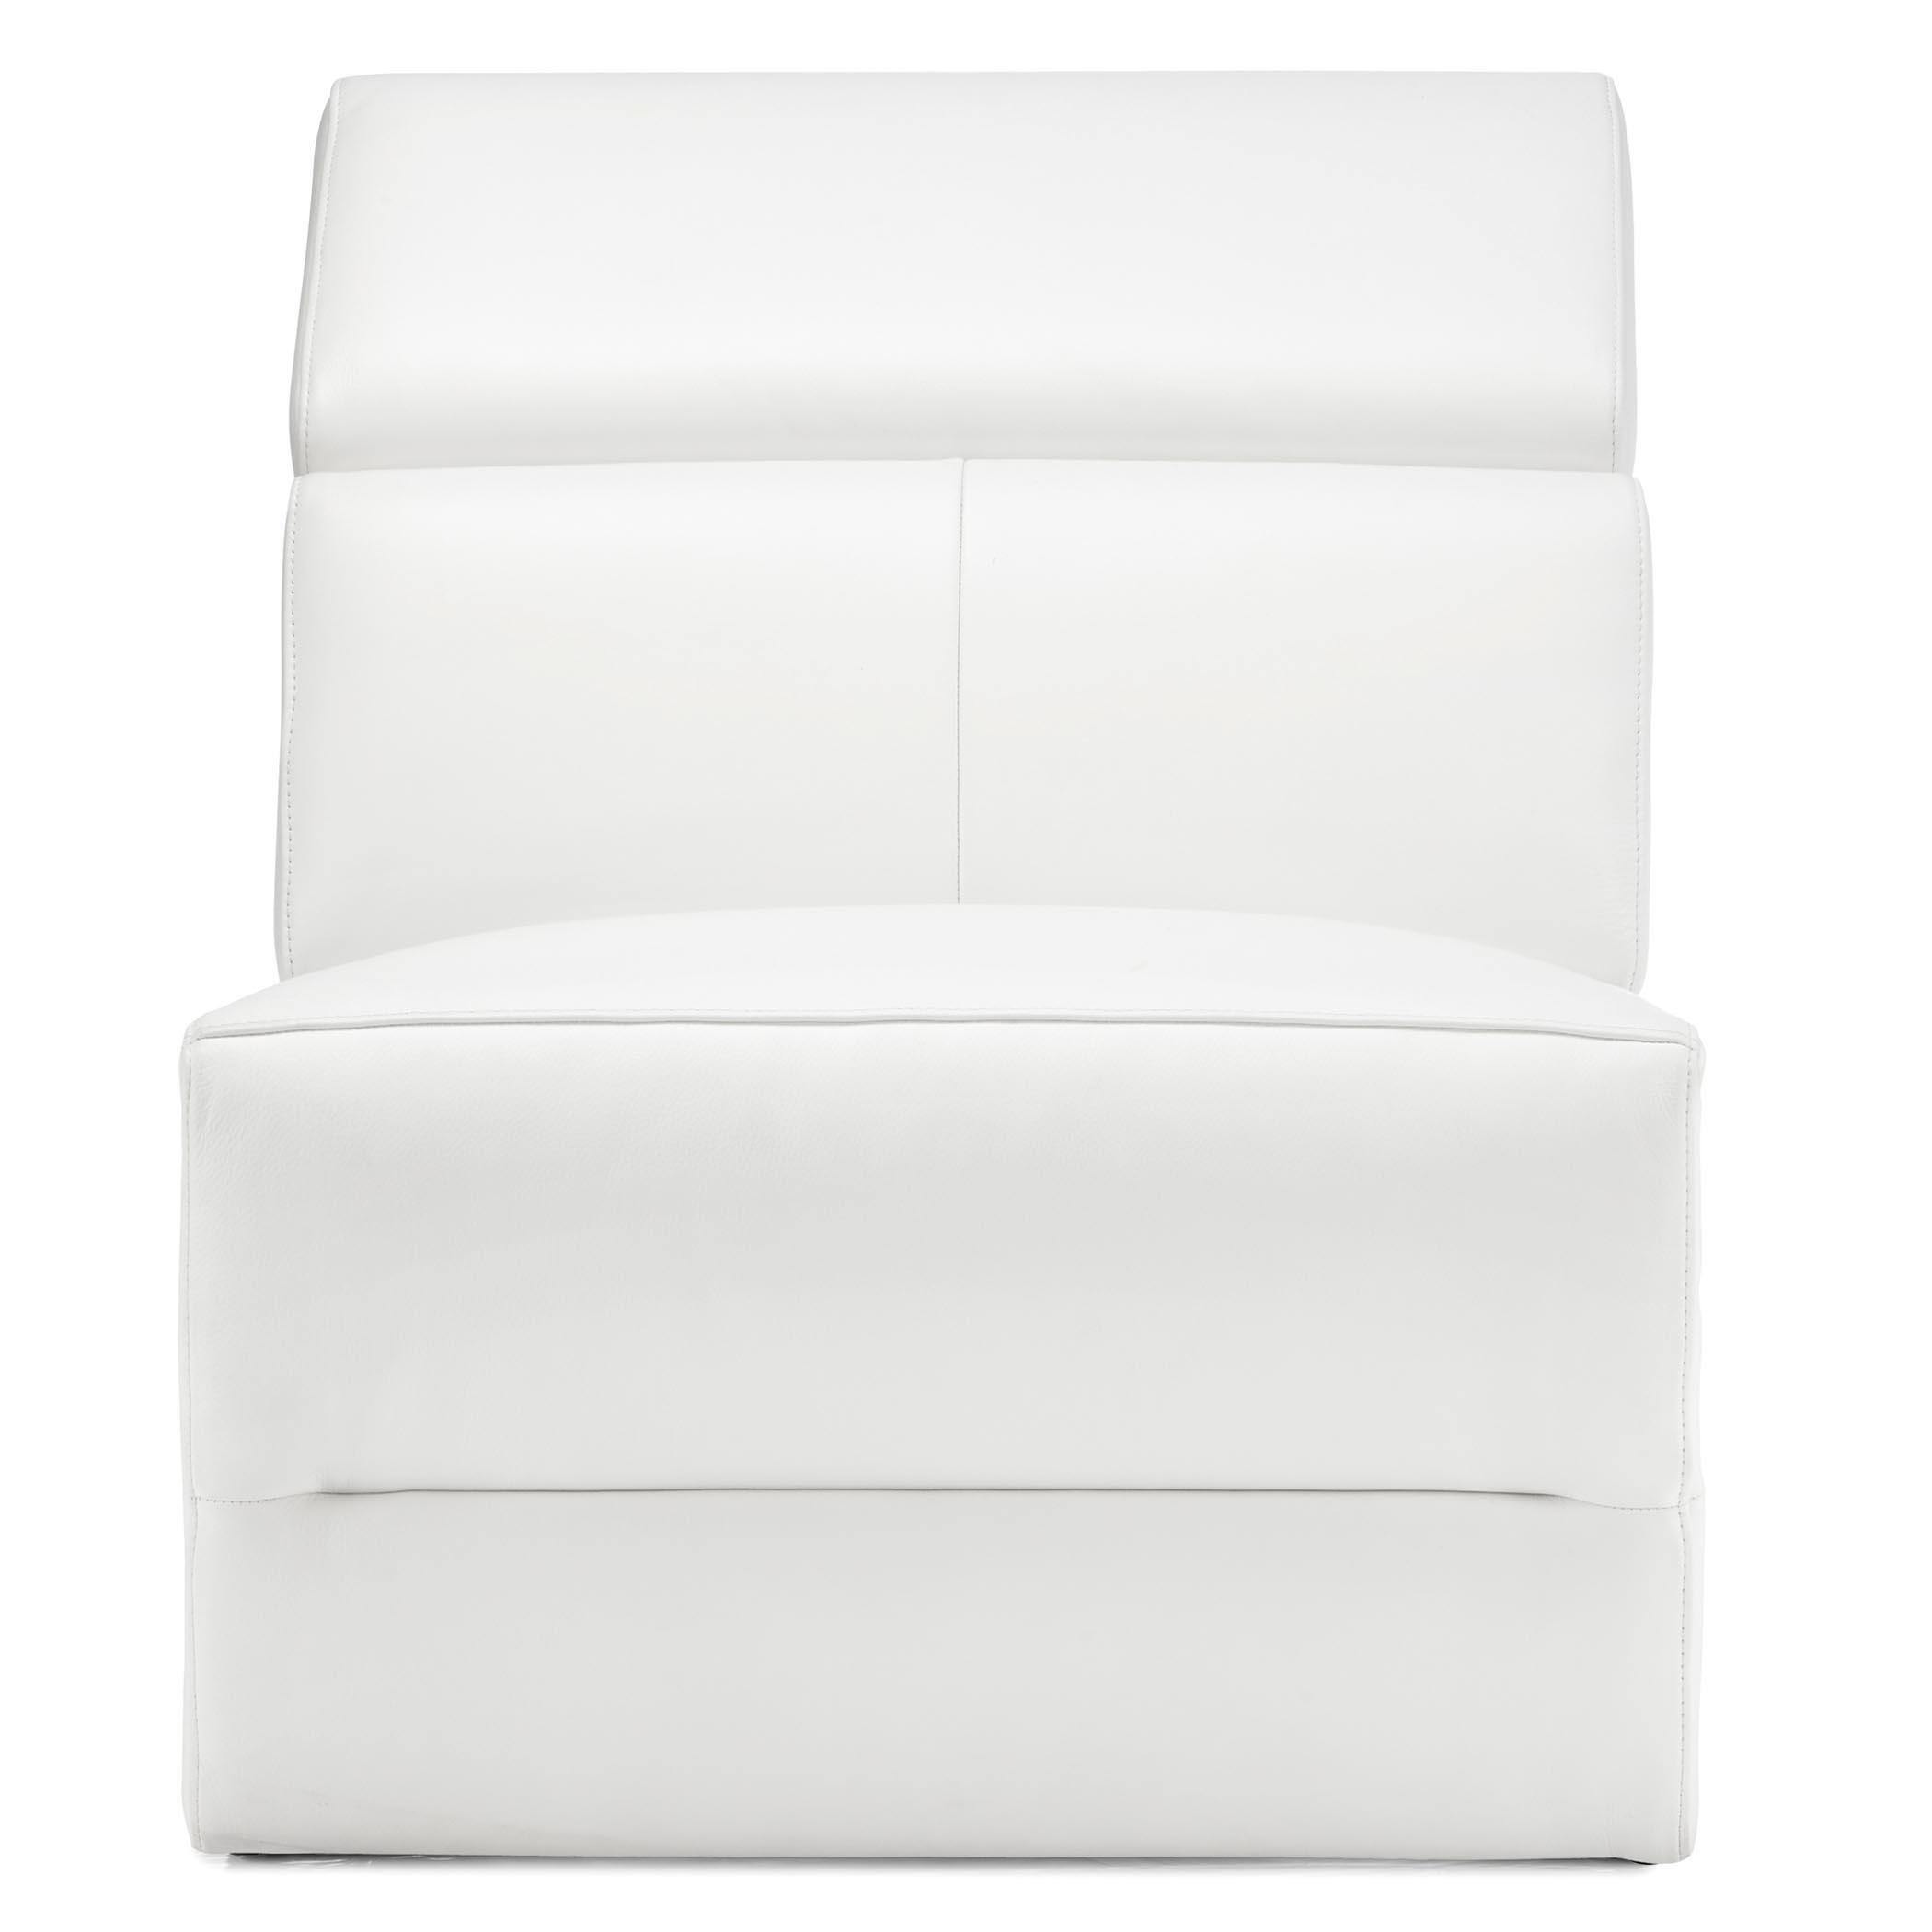 armless chair - no power